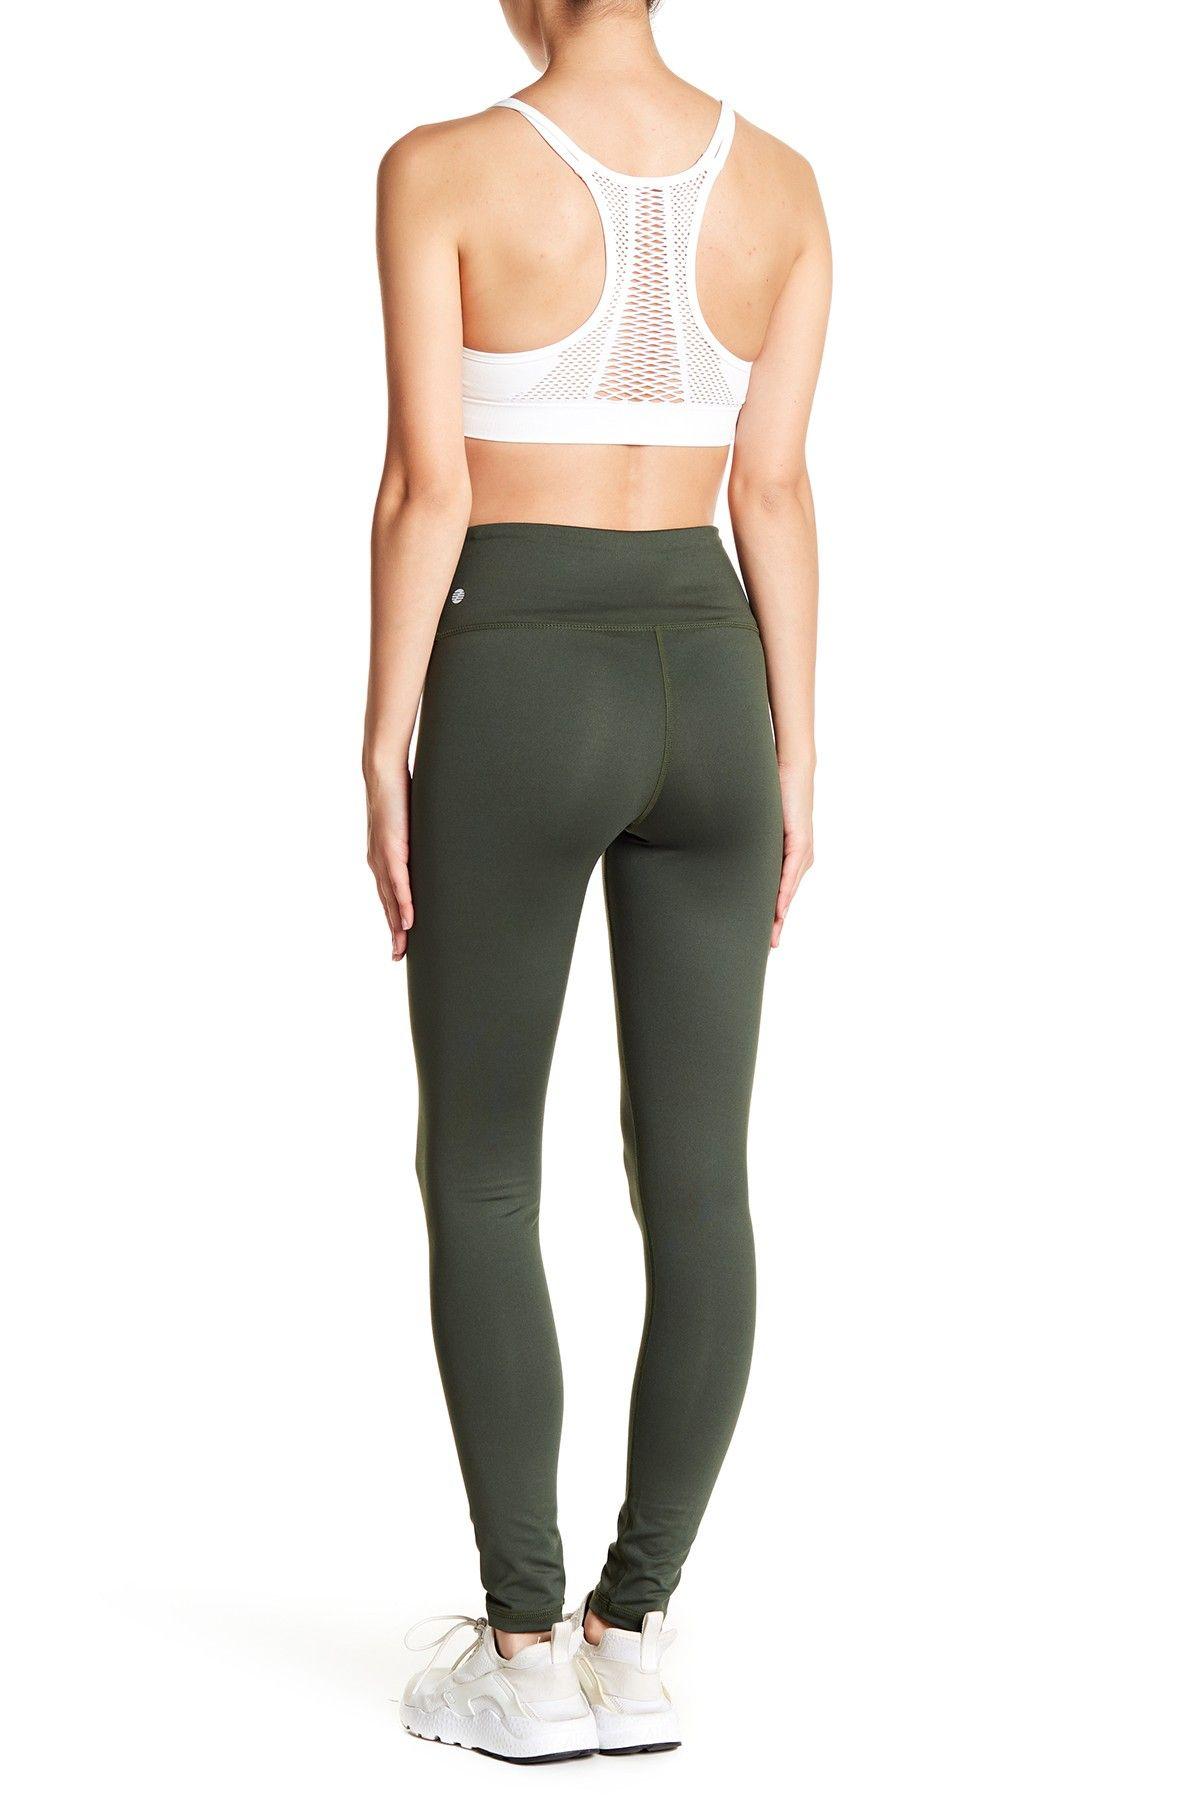 c21ad3a0a4ec2 Z By Zella | Nexus High Rise Crop Leggings | Fitness/Health | Leggings,  Nordstrom rack, Nordstrom